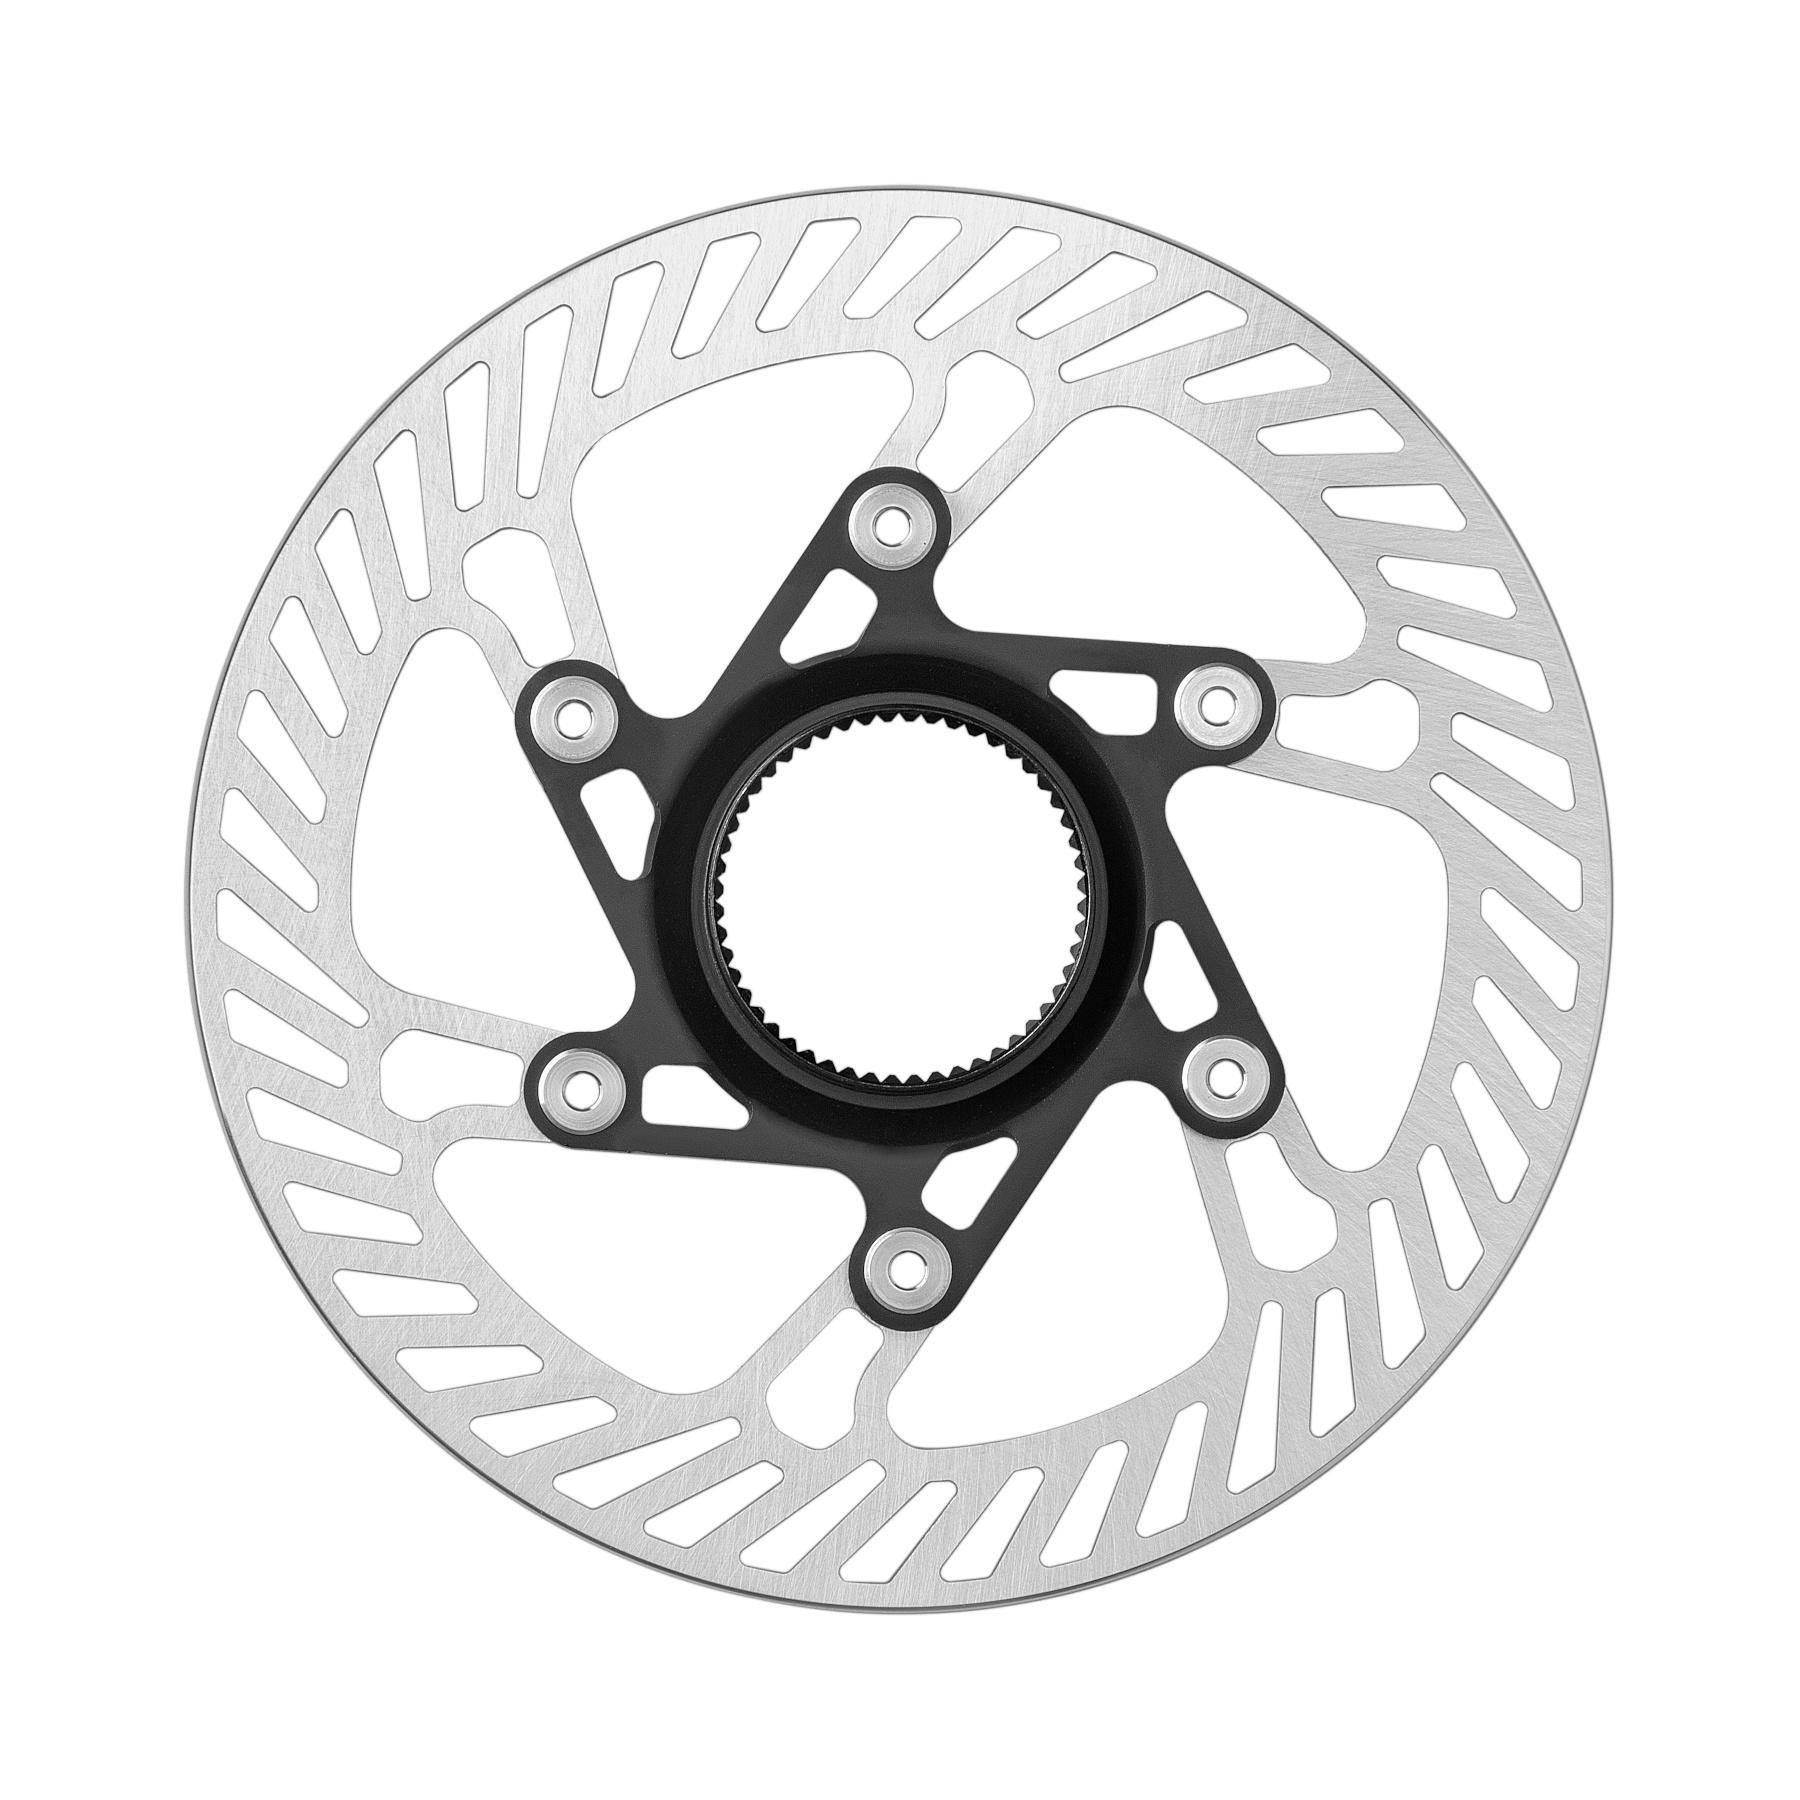 Campagnolo Ekar AFS Brake Disc